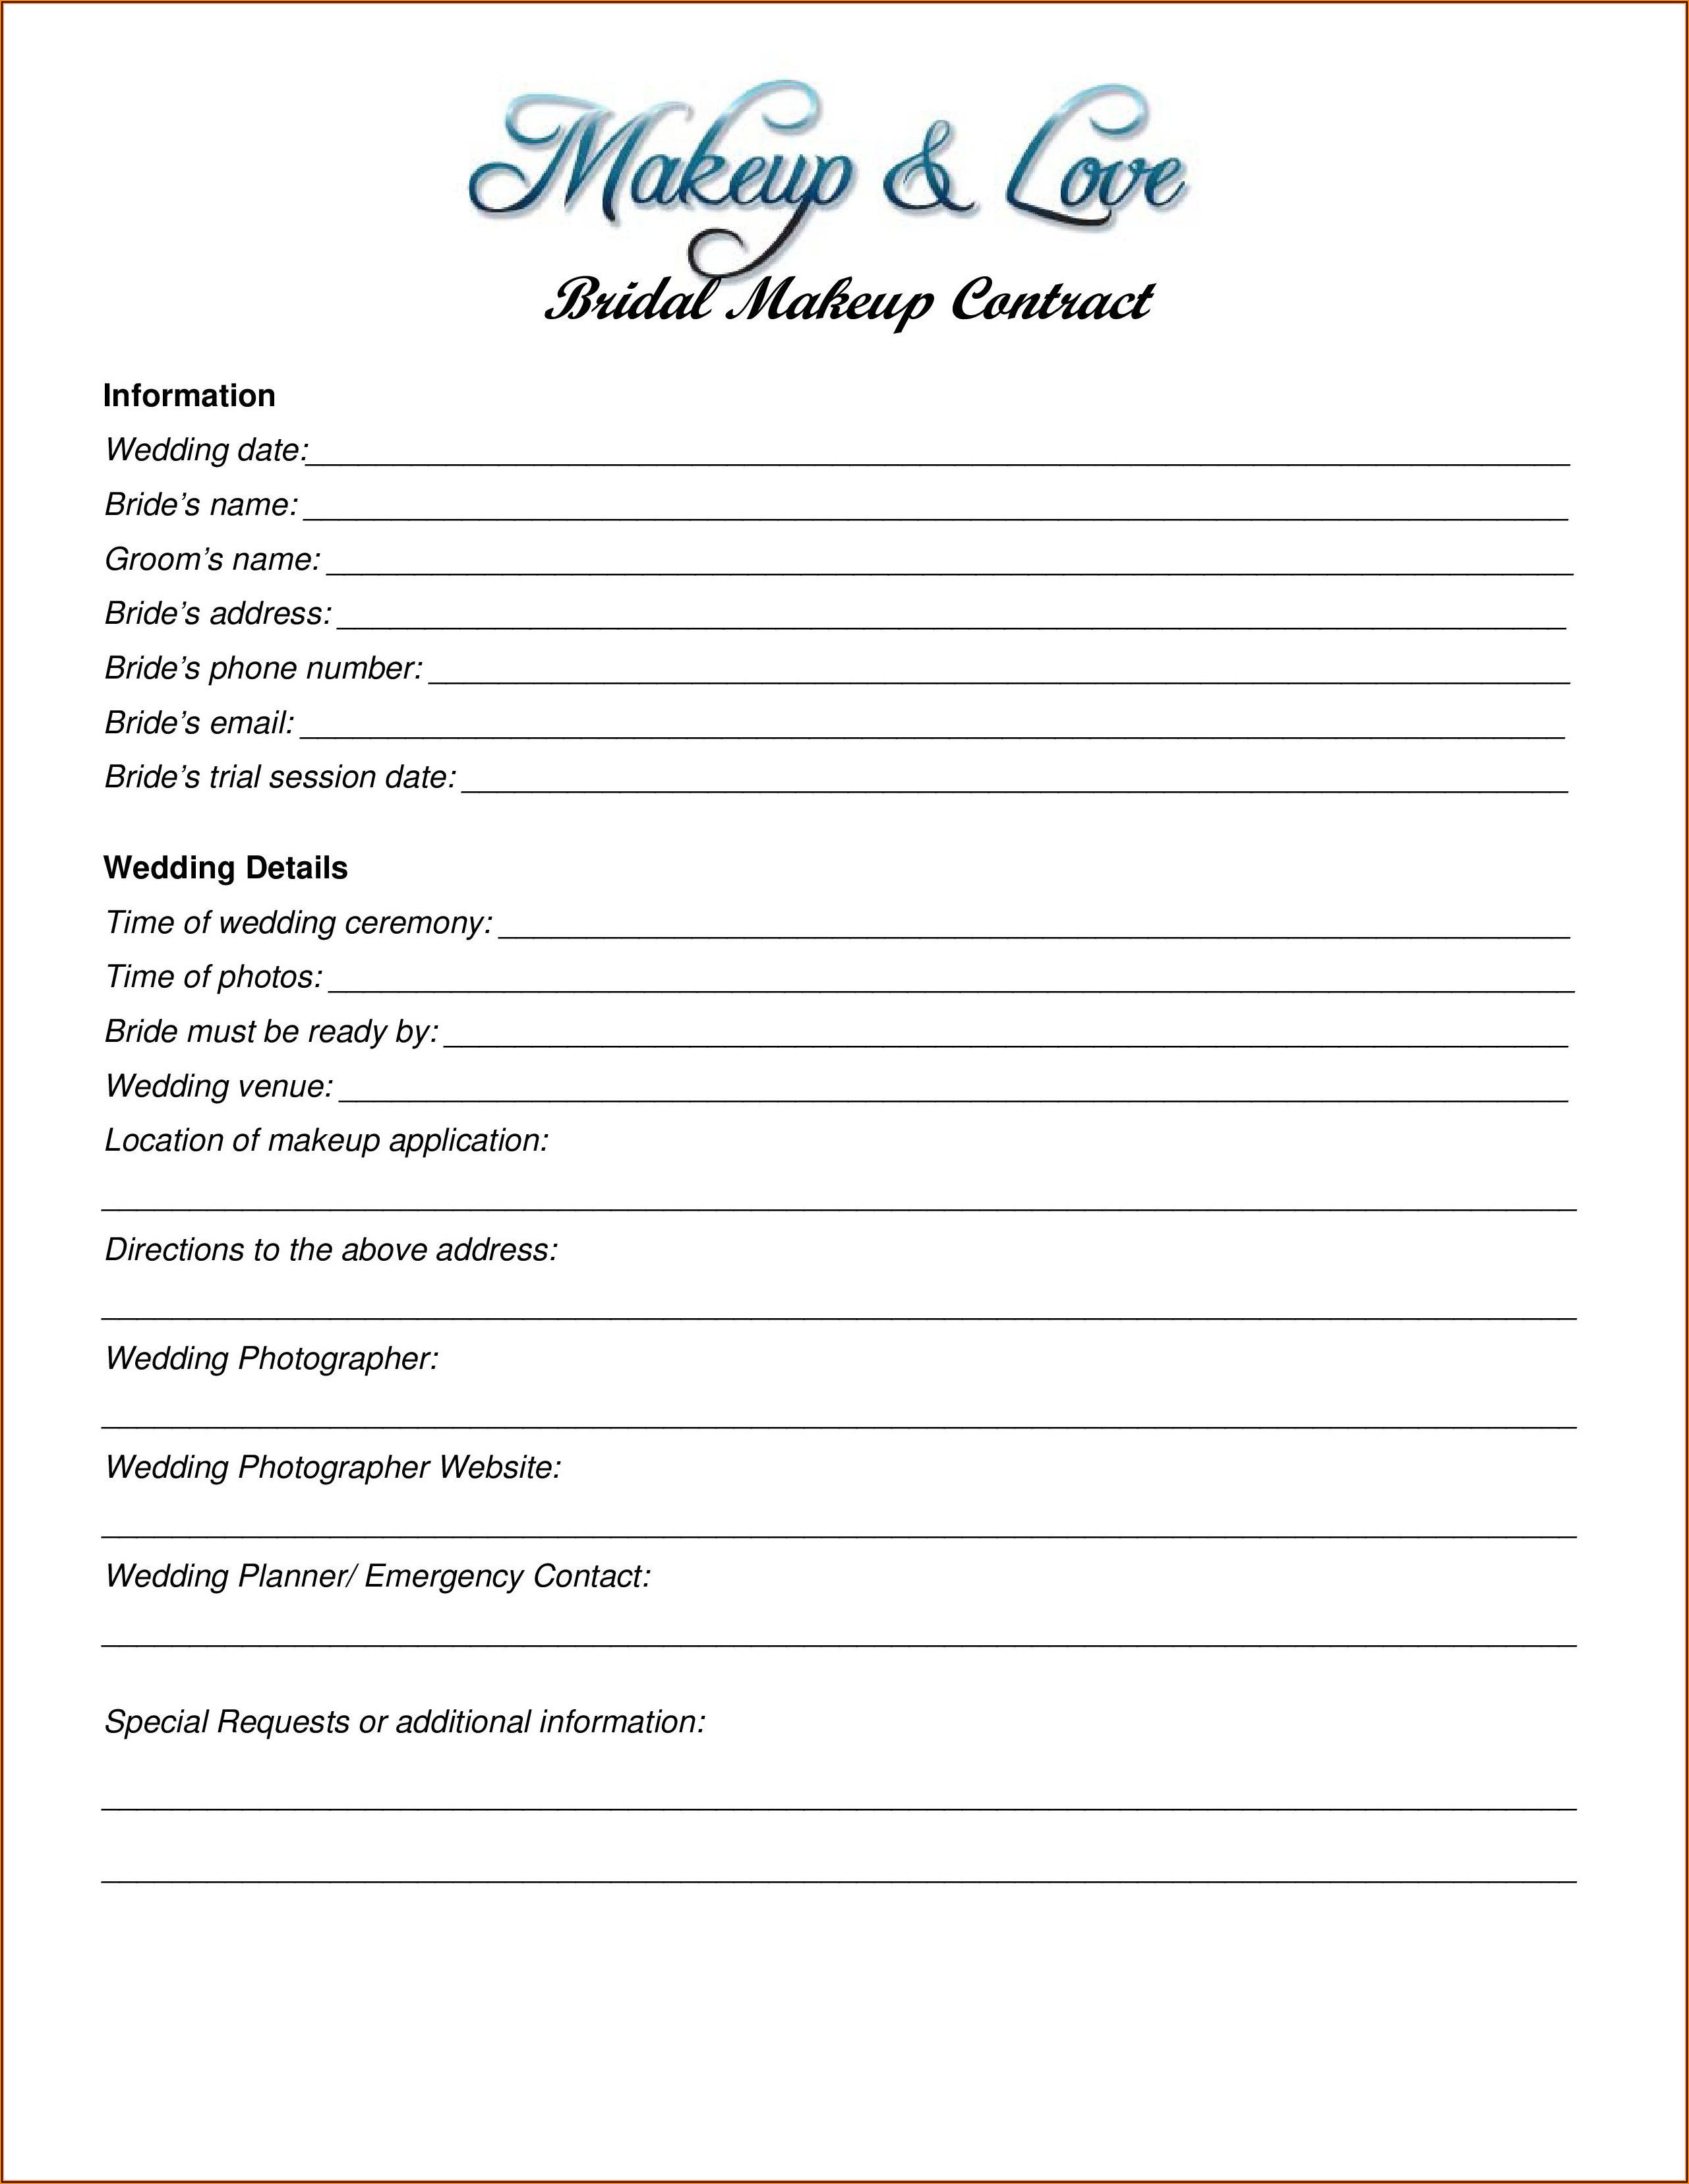 Bridal Makeup Contract Template